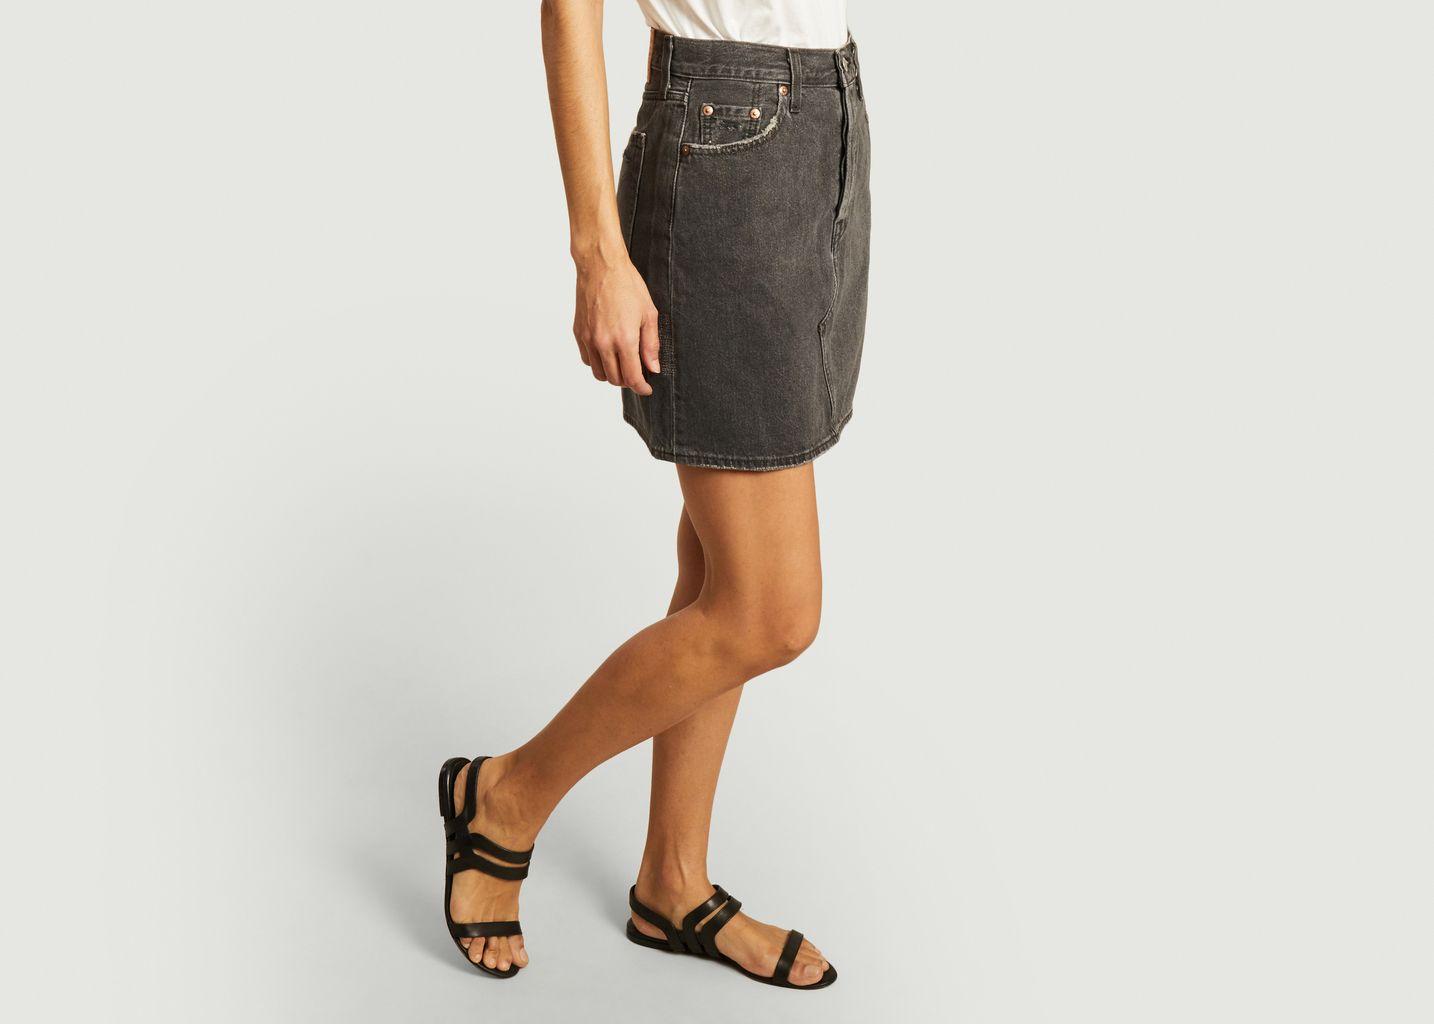 Jupe taille haute en jean teinté - Levi's Red Tab